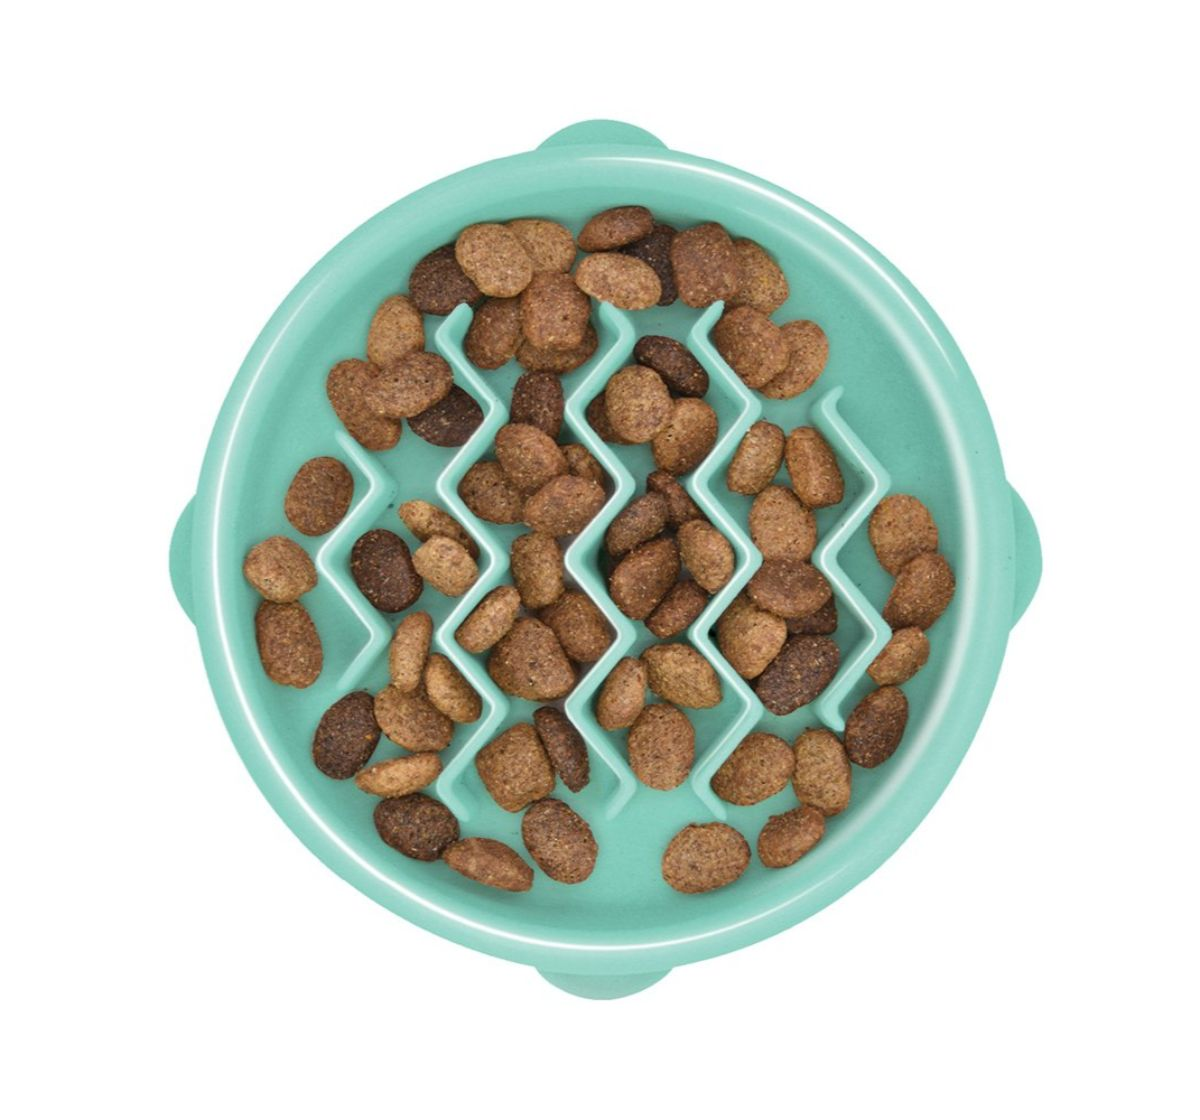 Outward Hound Fun Feeder Slo-Bowl Tiny Slow Feeder - 15.2 cm